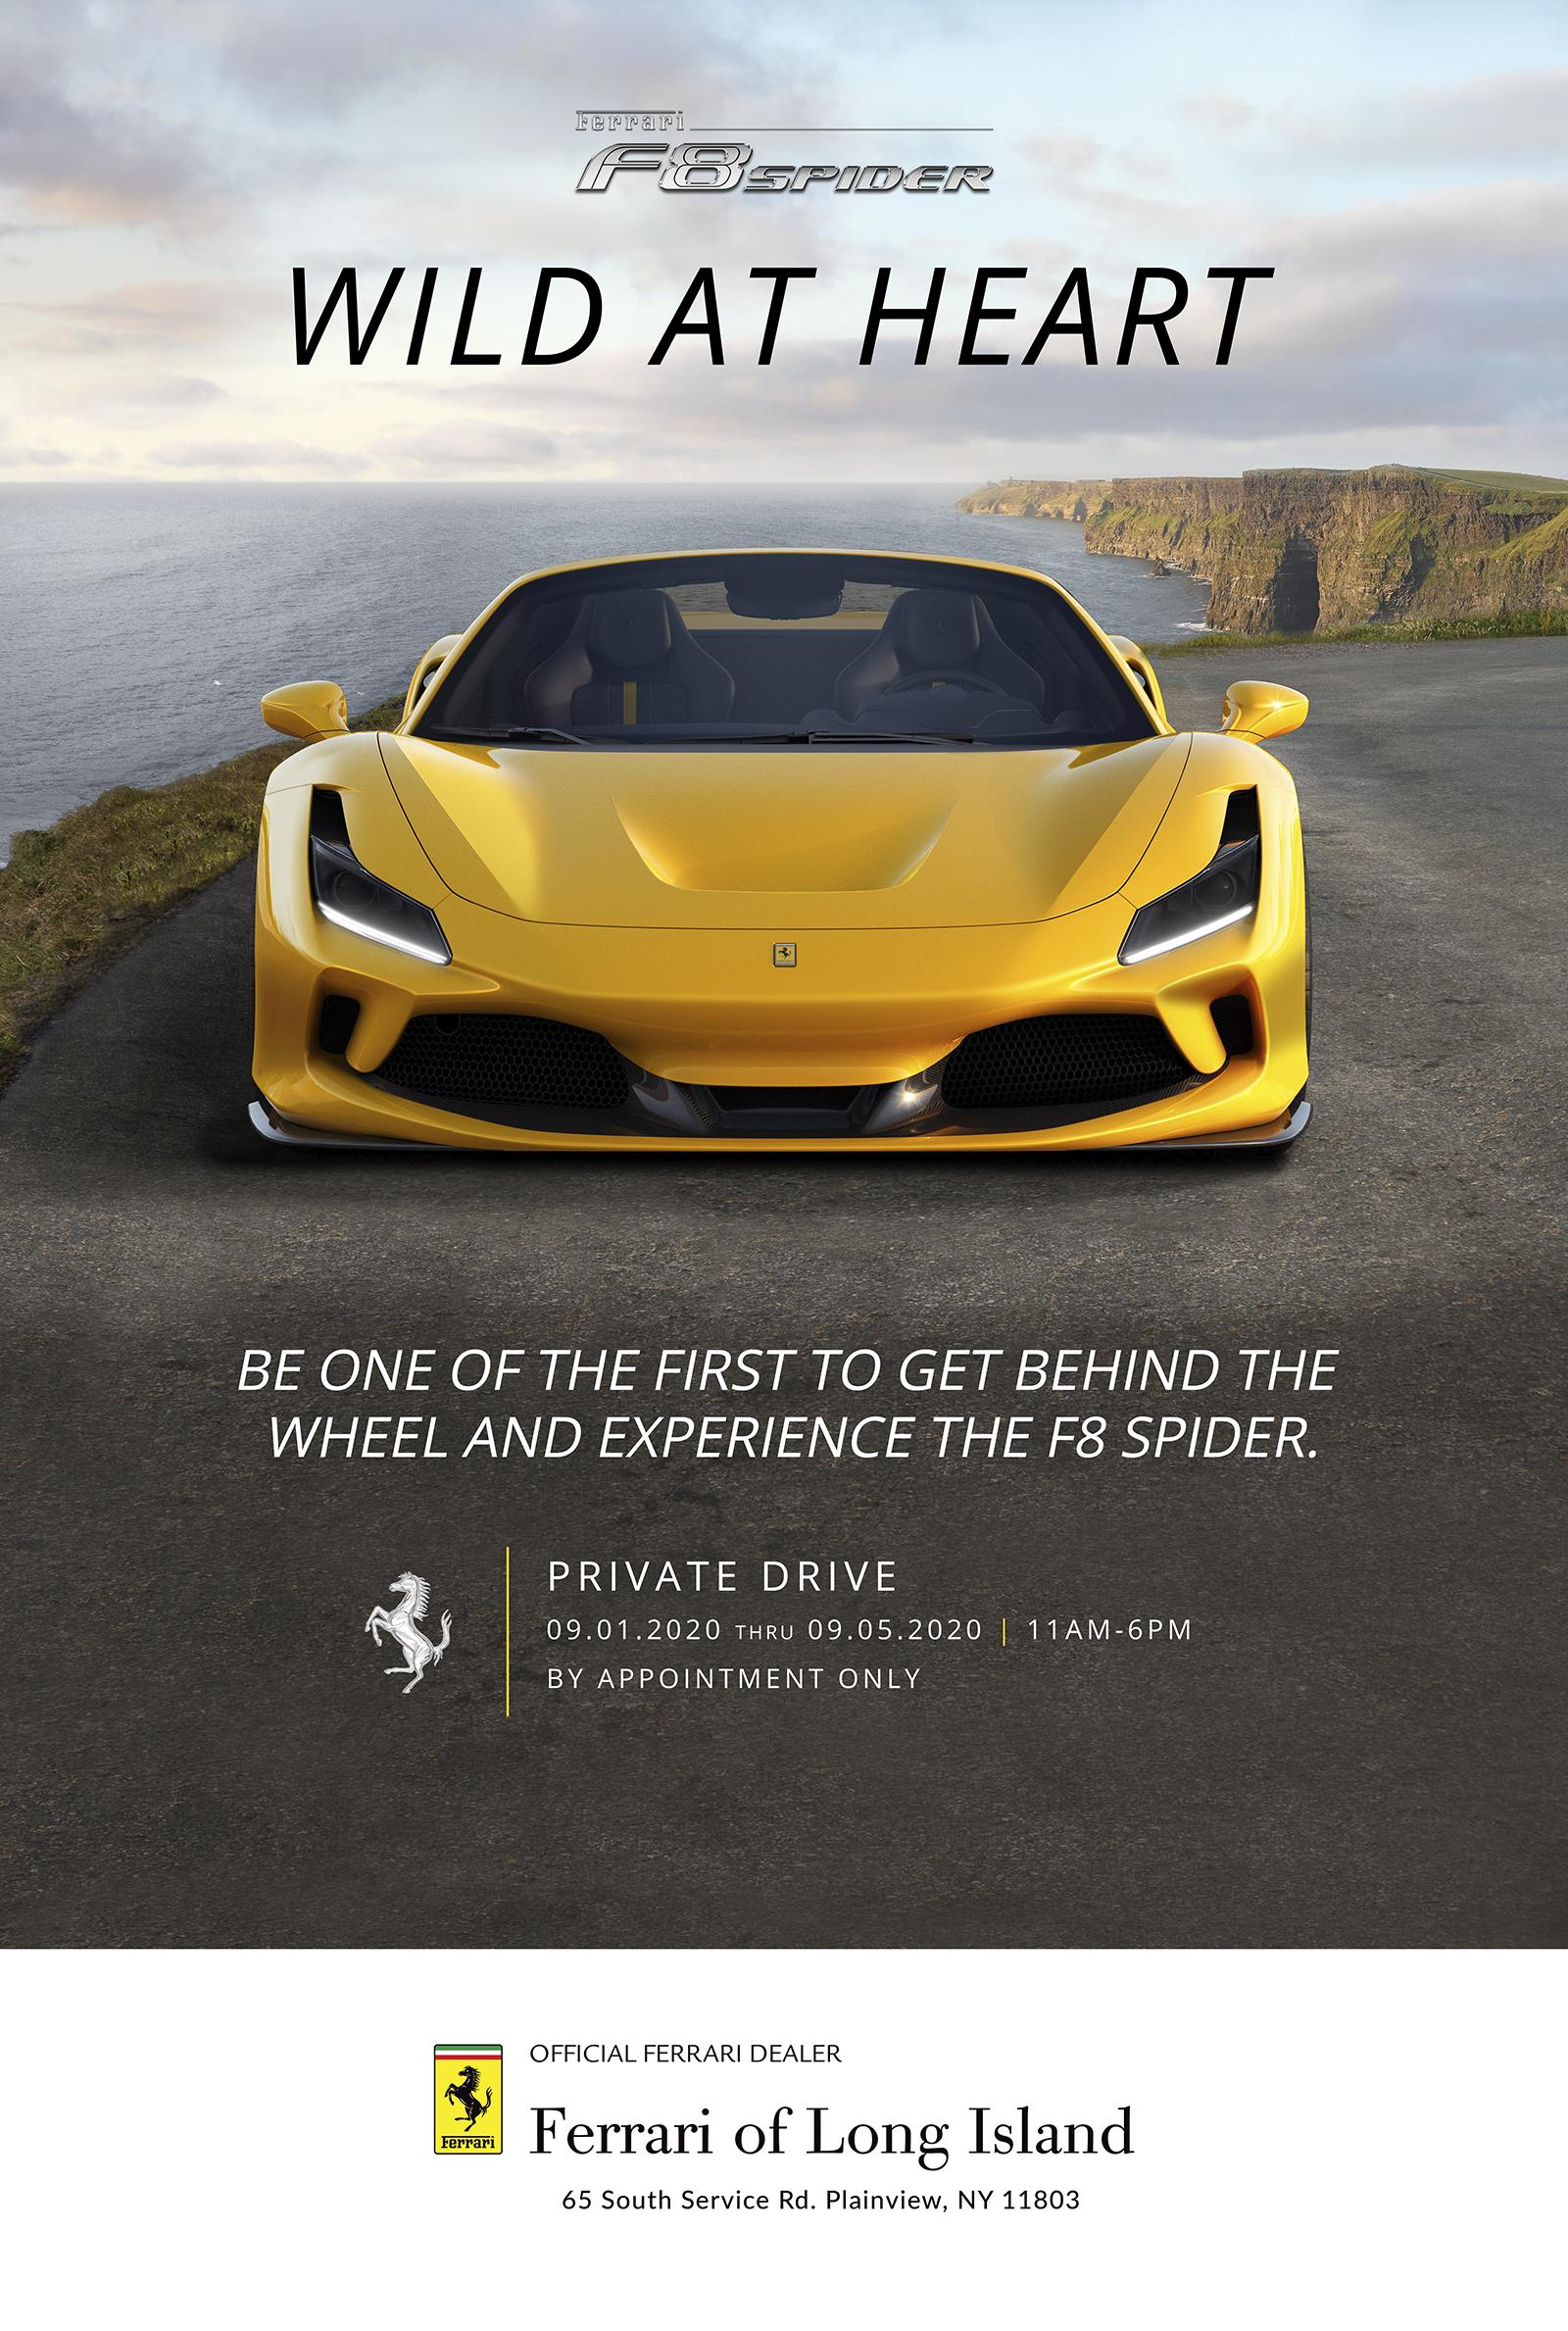 Test Drive the New Ferrari F8 Spider